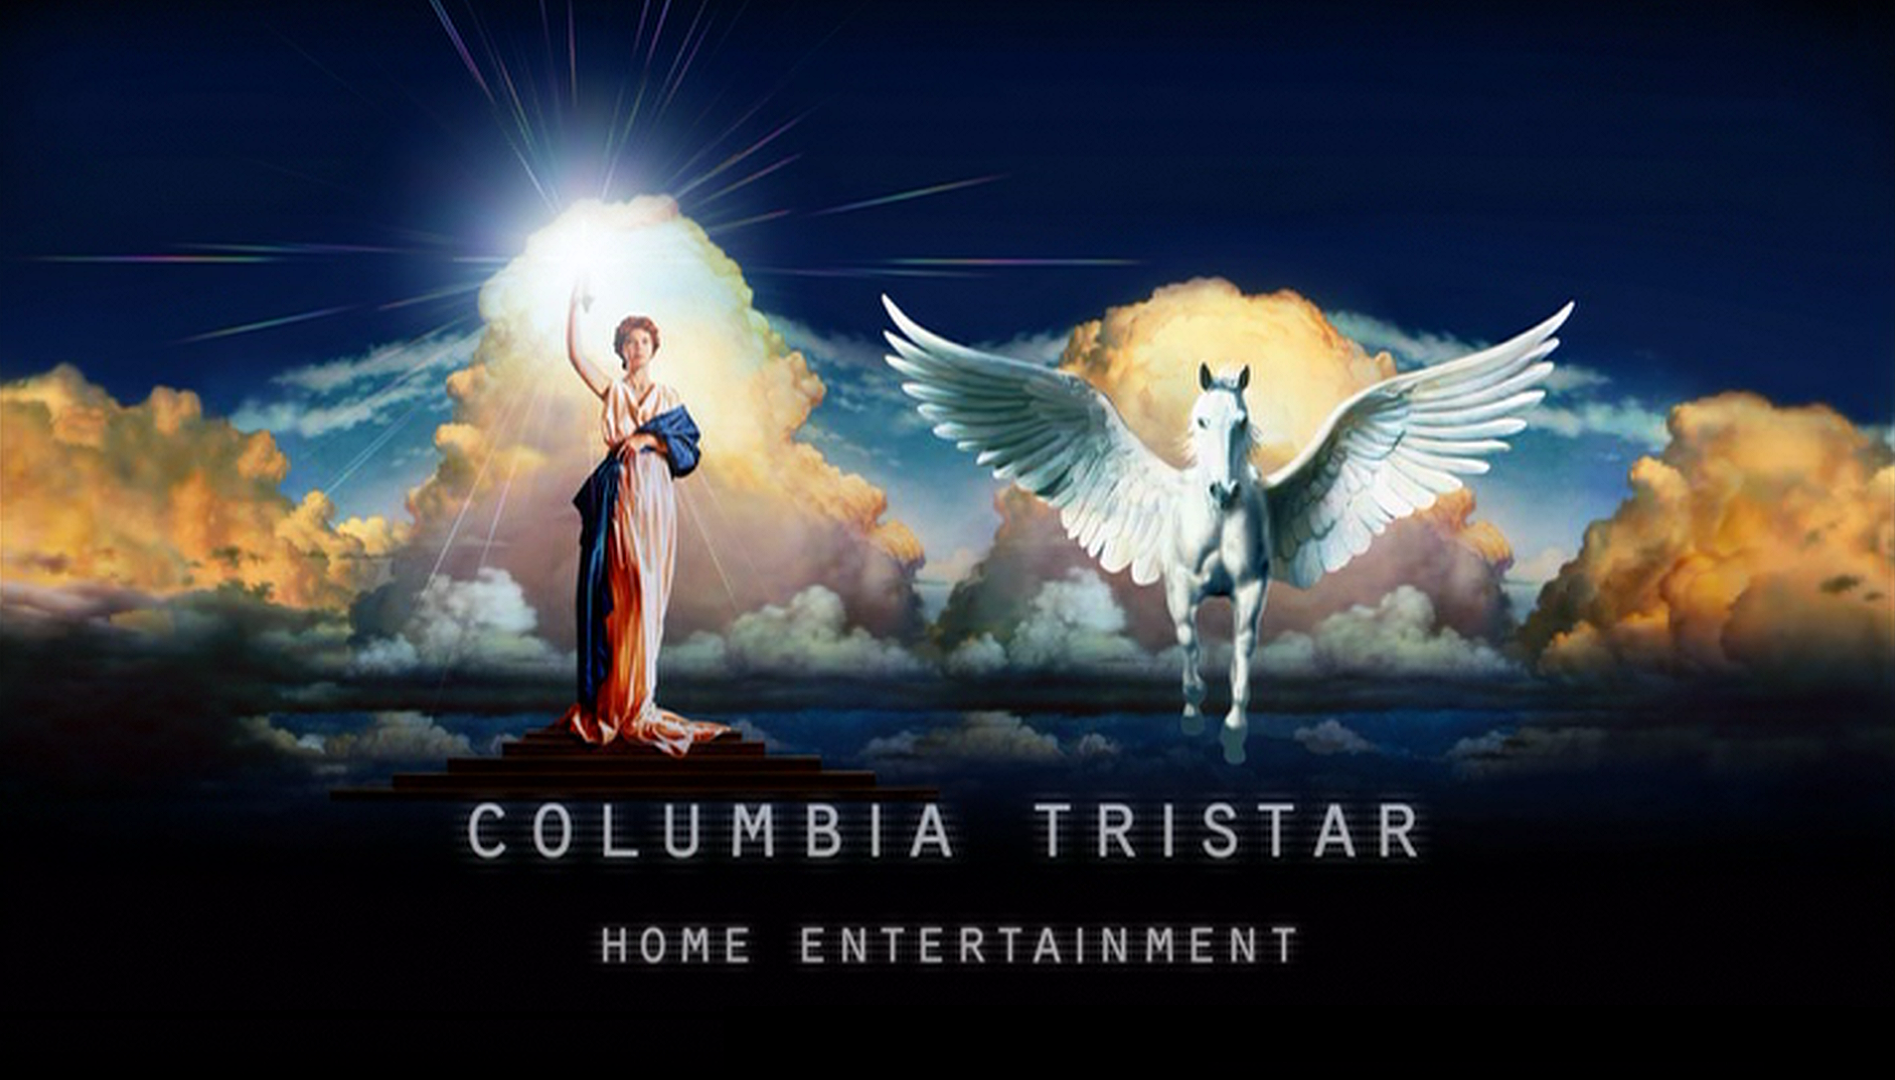 image columbia tristar home entertainment 2001 dvd columbia tristar home video logo 1993 columbia tristar home video logo 1993